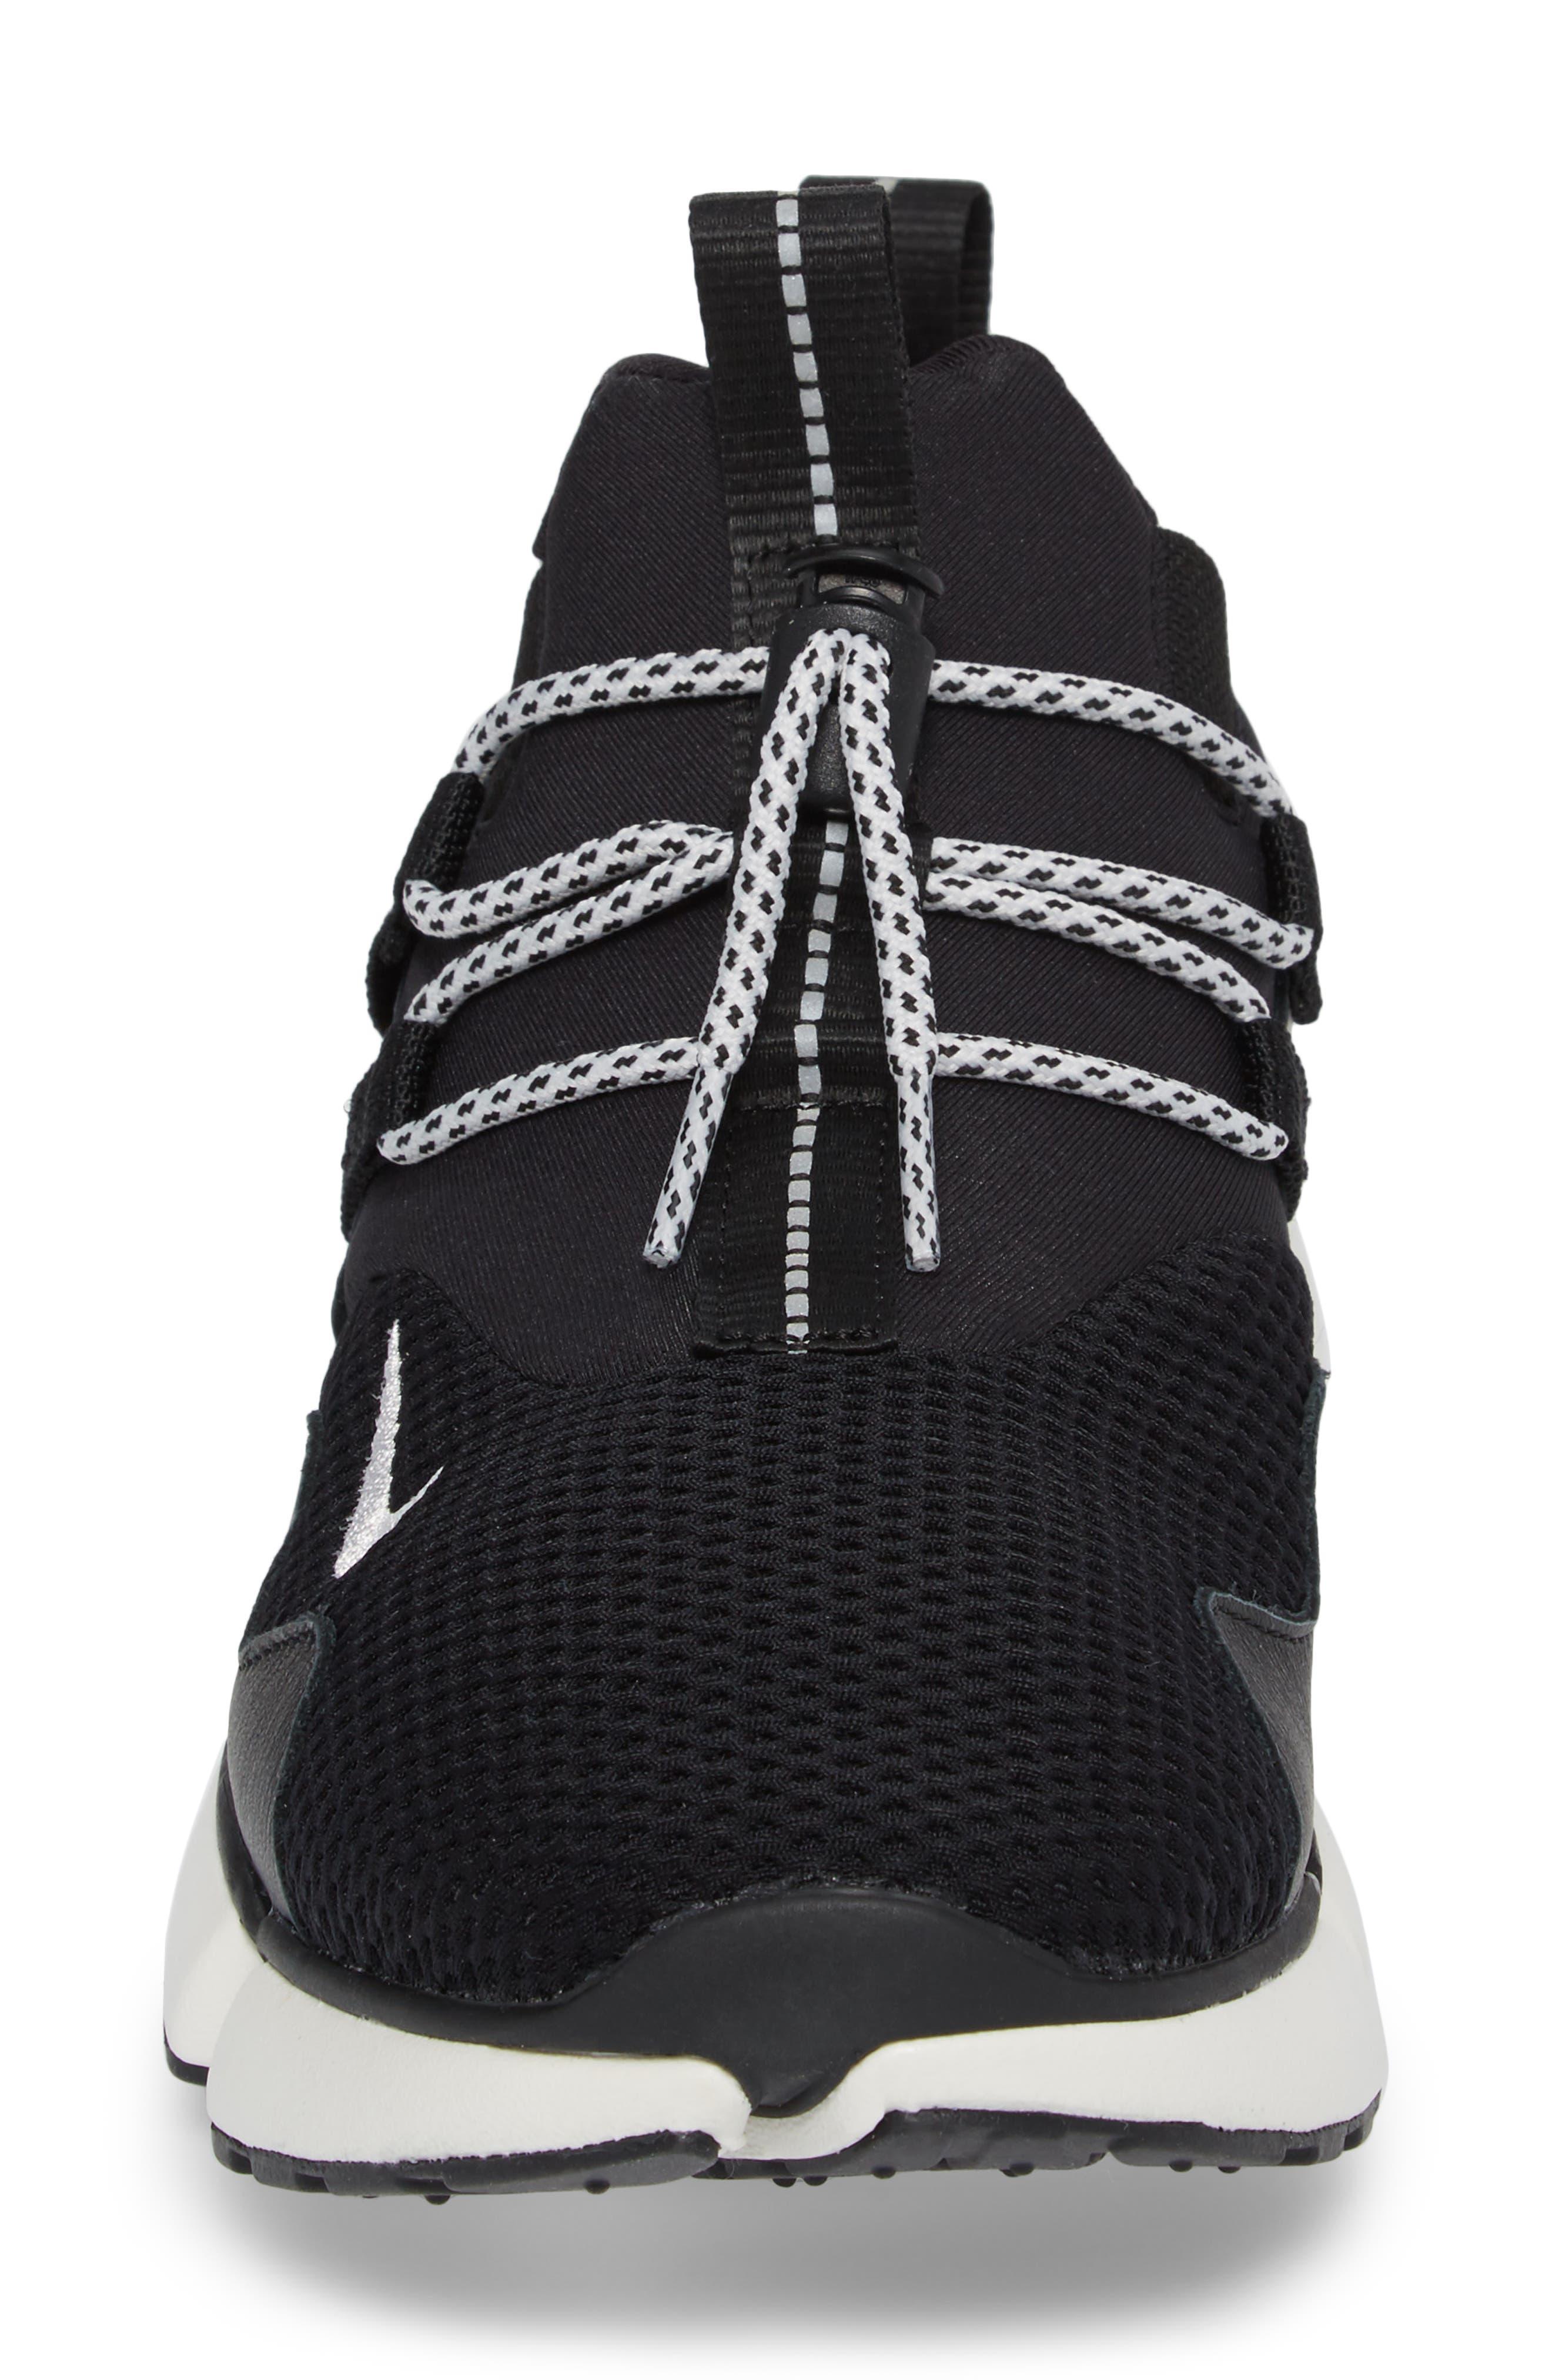 Pocket Knife DM Sneaker,                             Alternate thumbnail 4, color,                             Black/ Vast Grey/ Sail